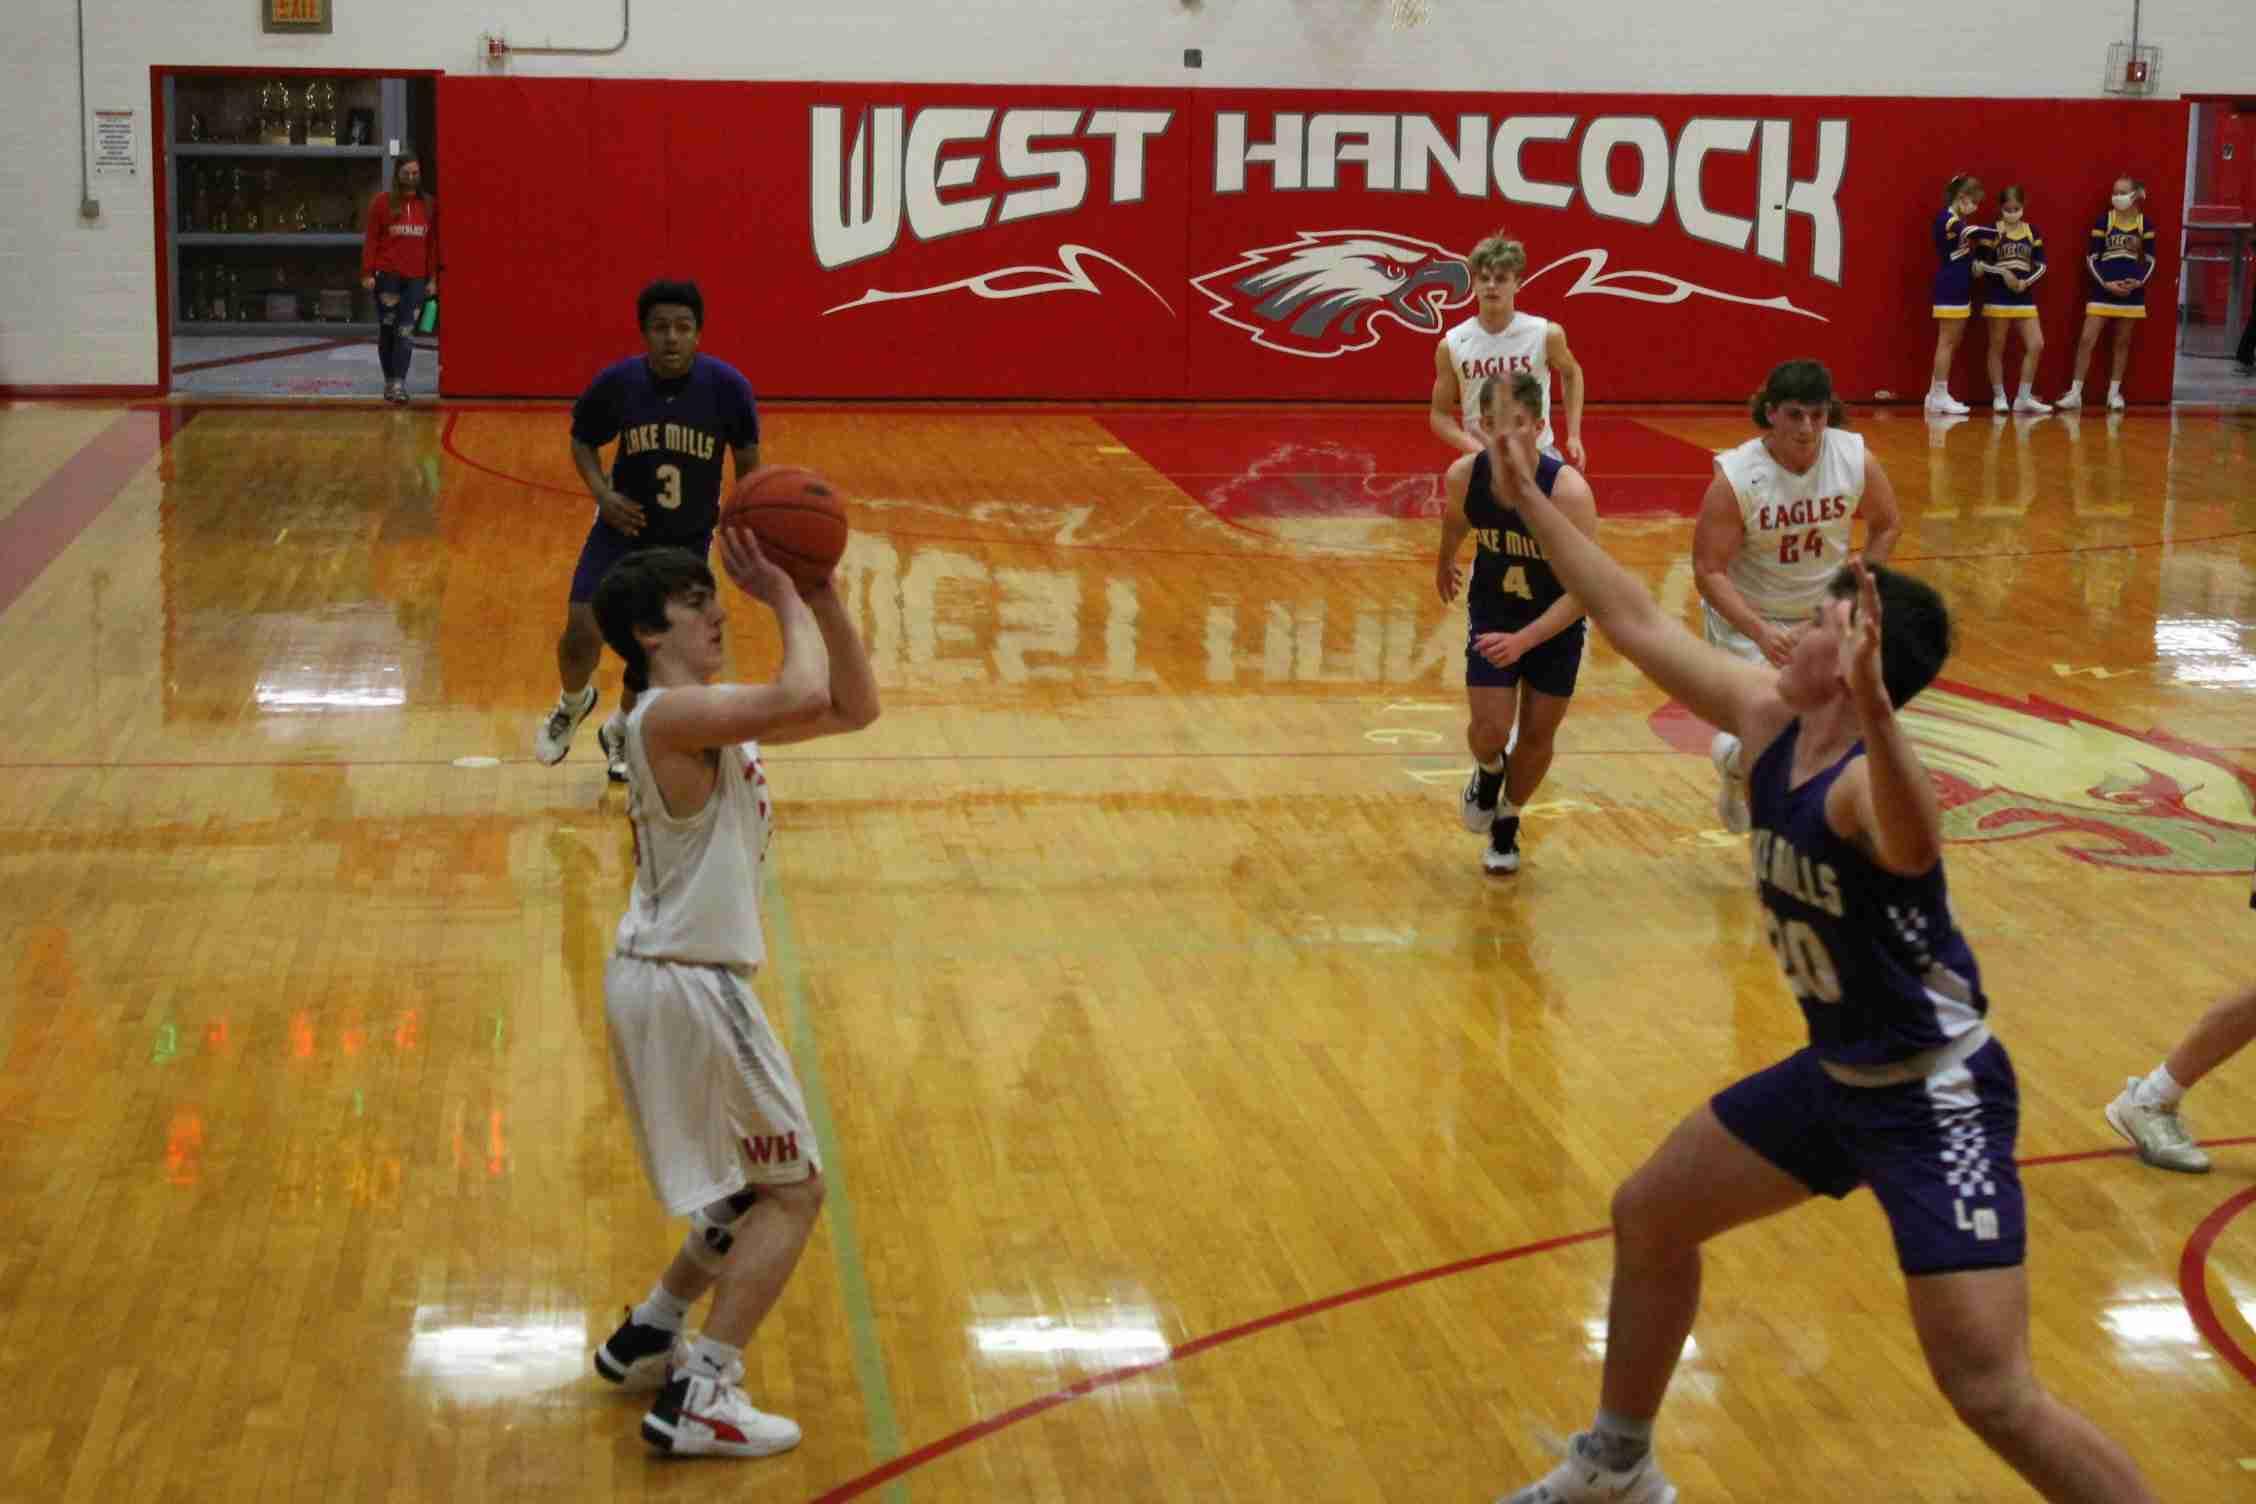 west hancock vs LM 102